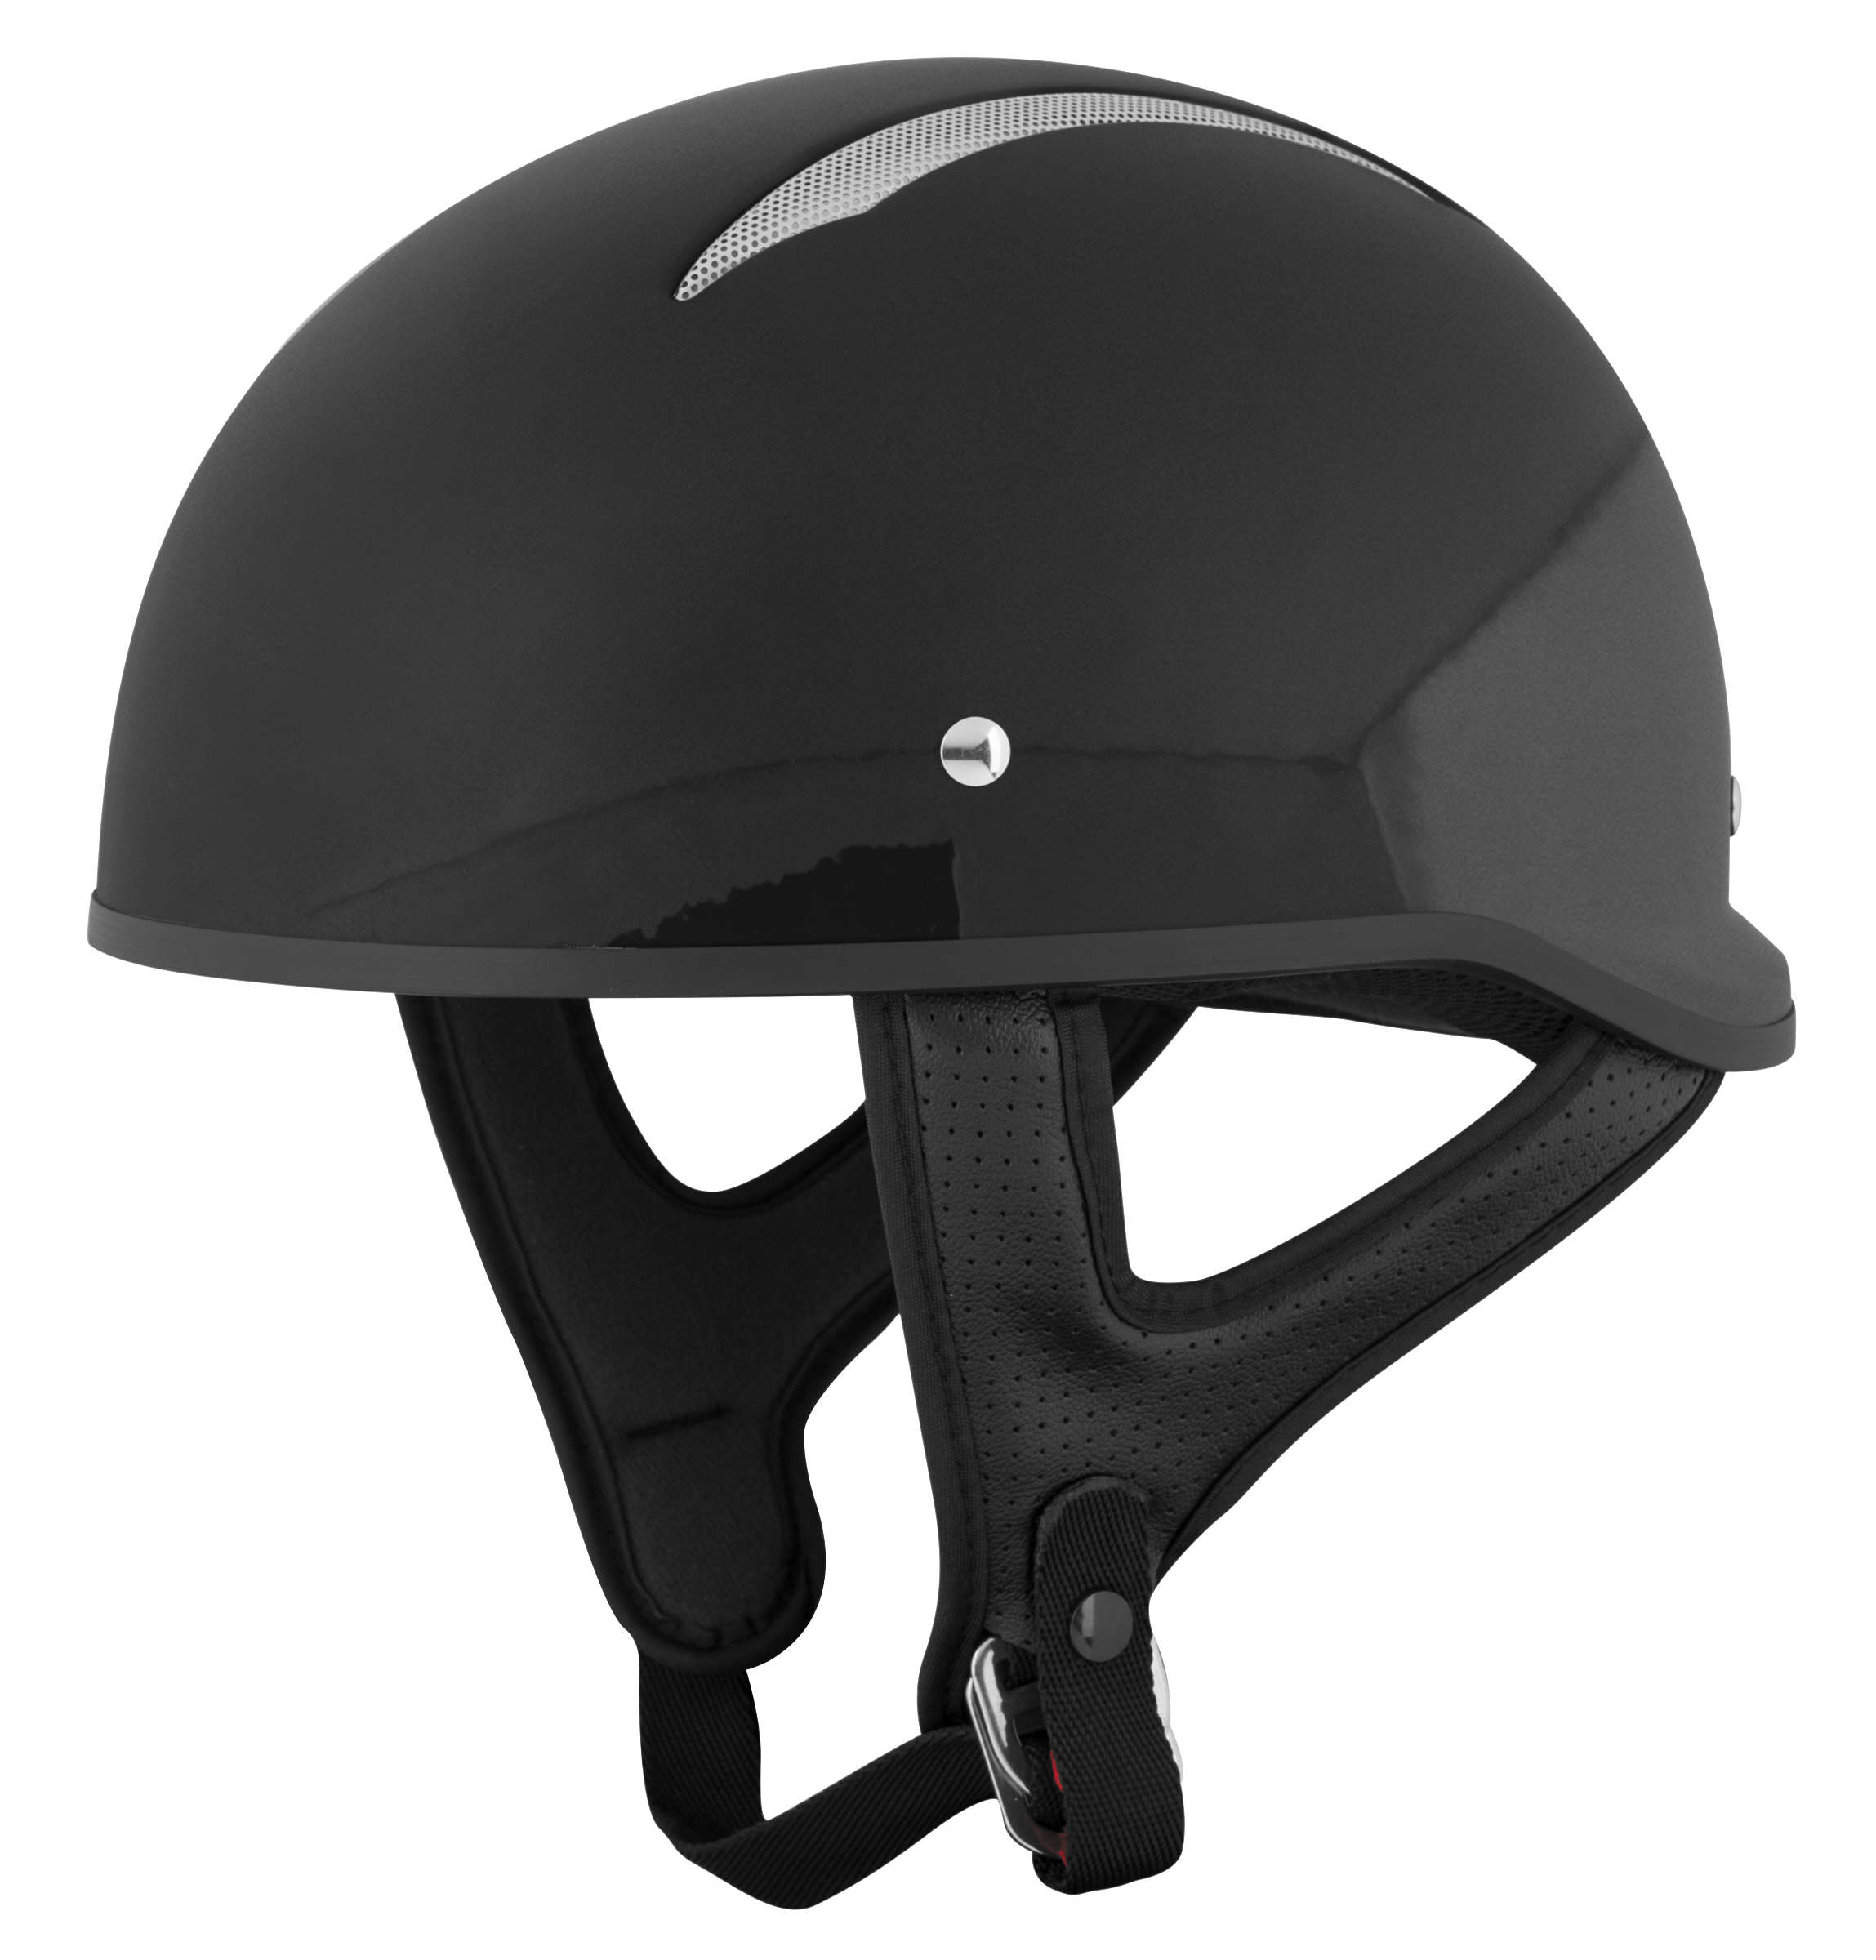 SS310 Solid Speed Half Helmet